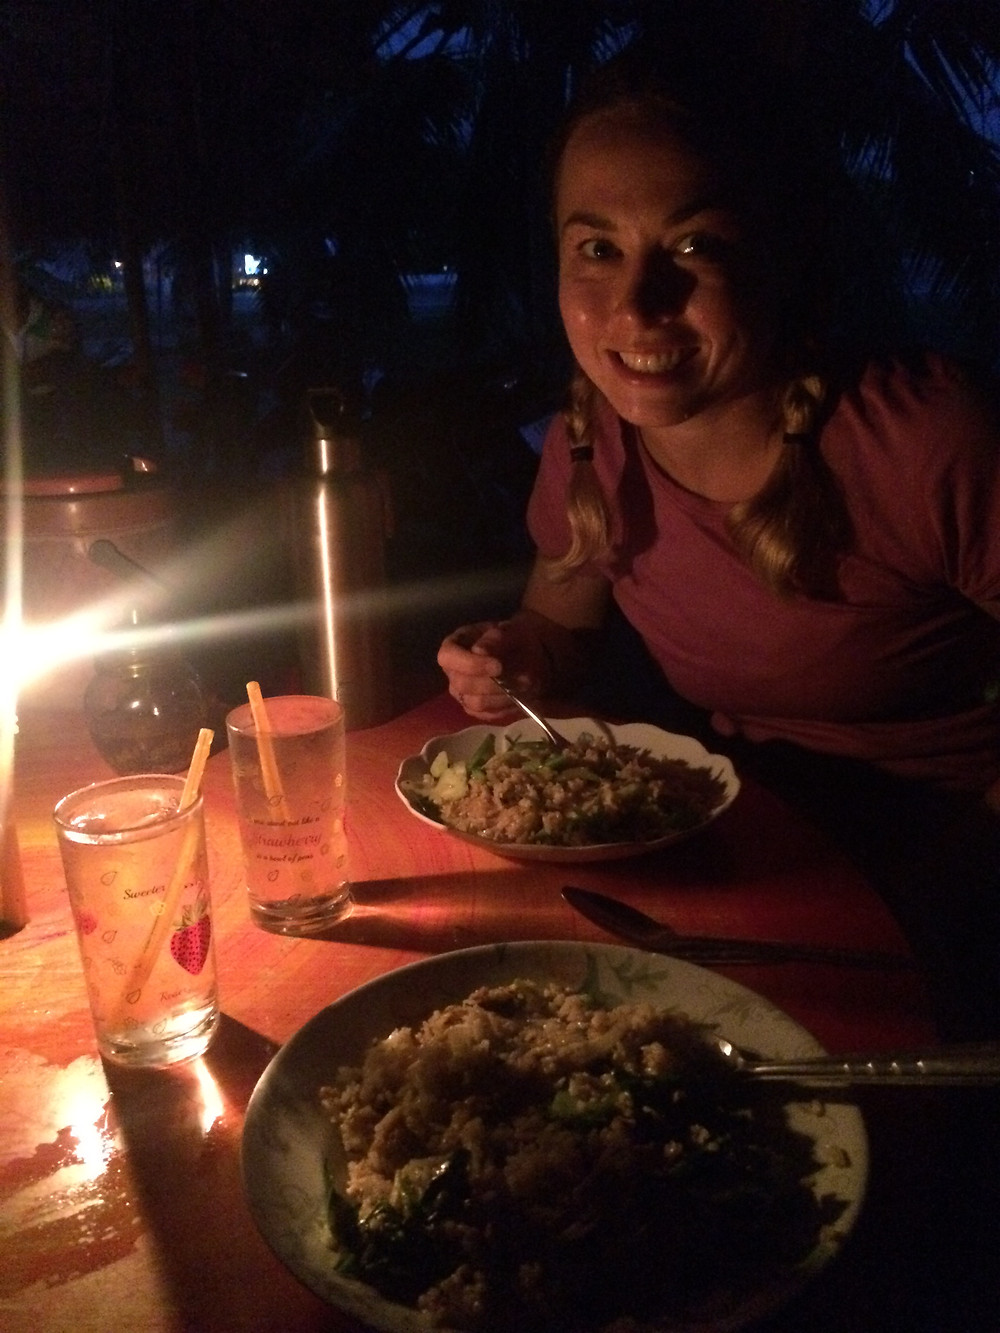 Teagan's birthday dinner